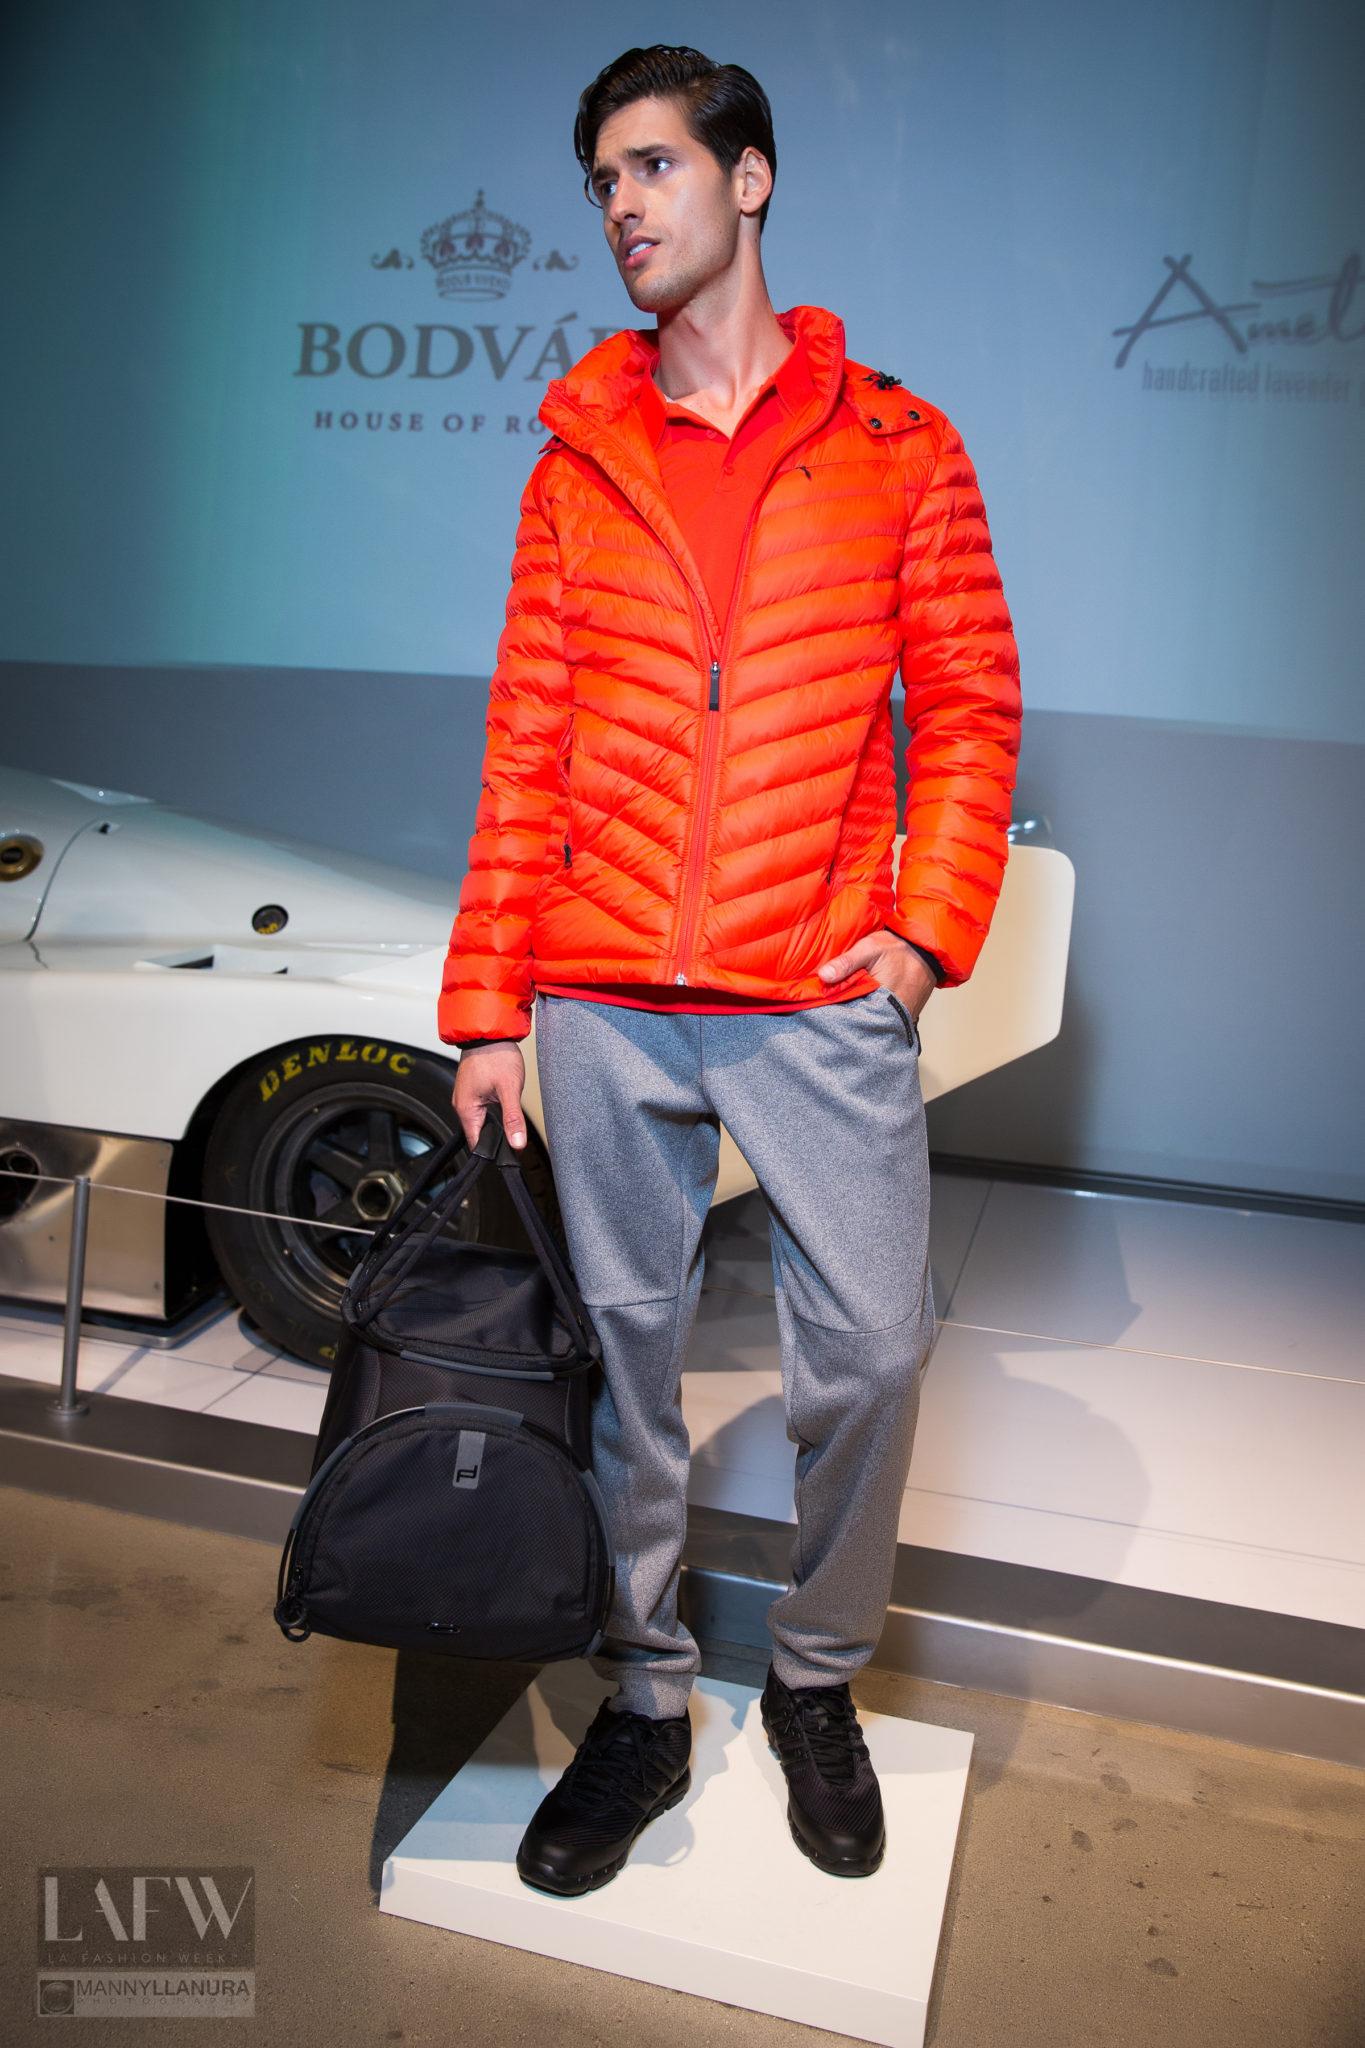 Porsche Design Cars and Fashion